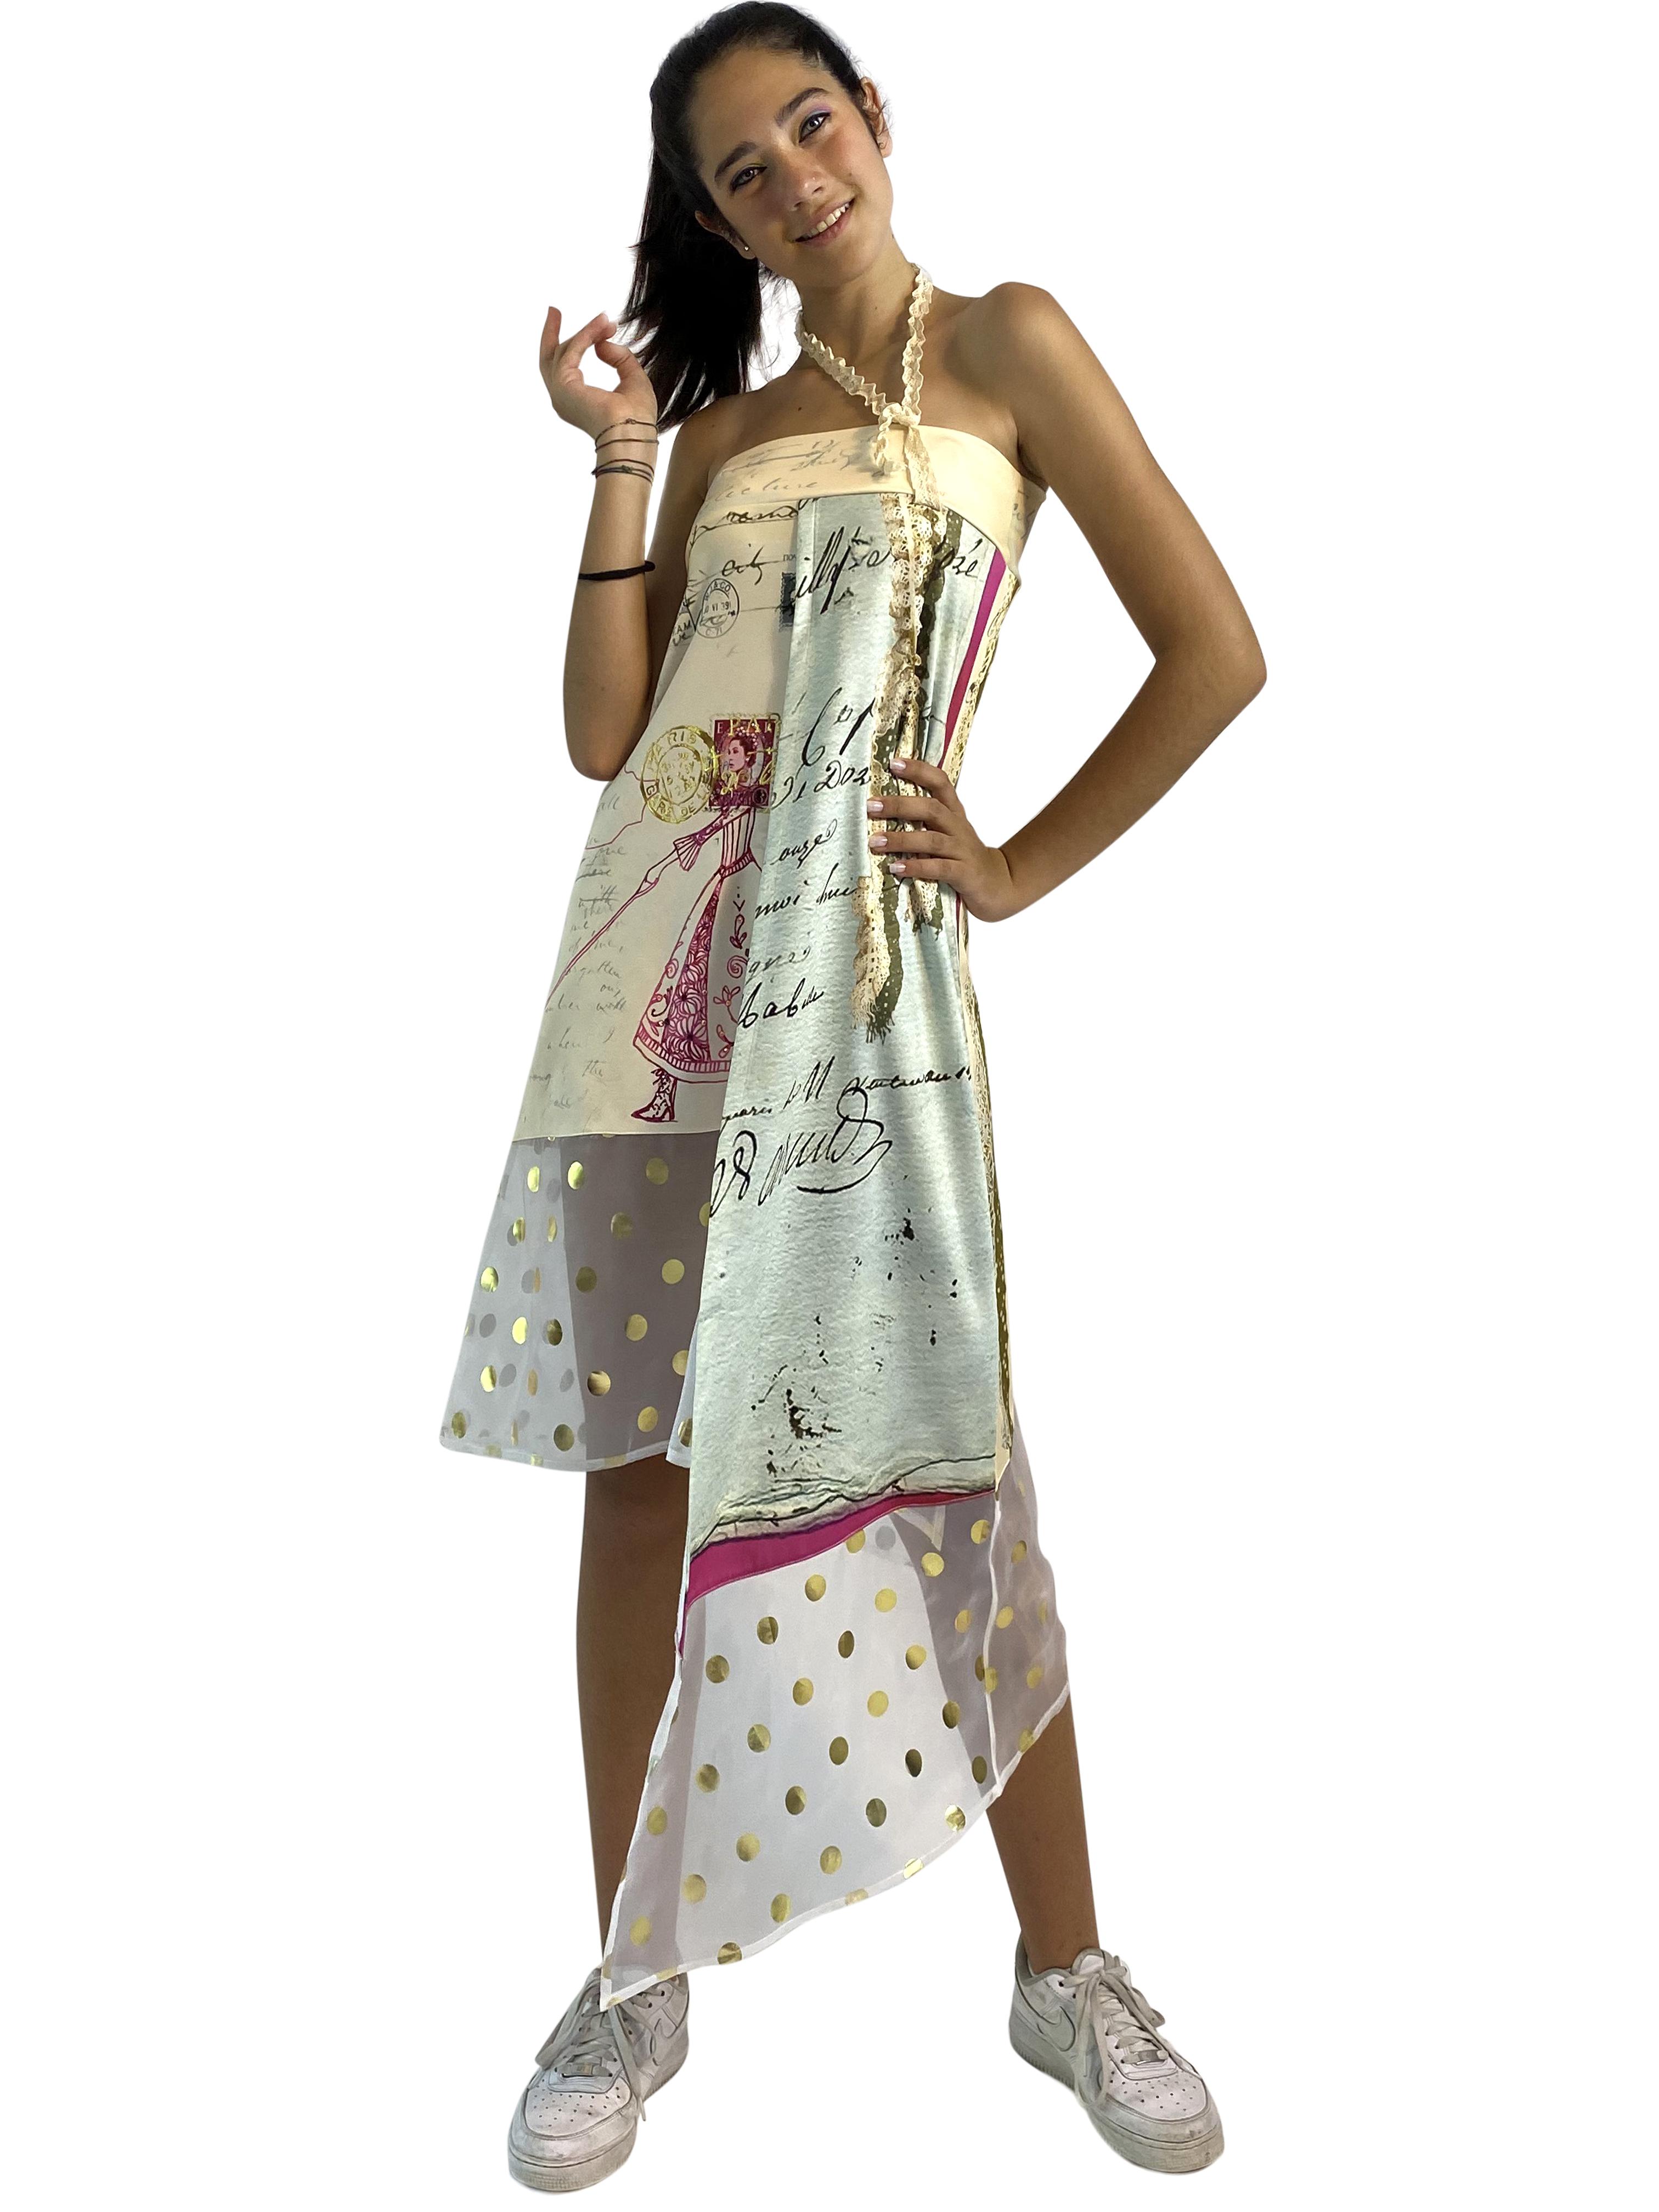 IPNG: If I Was Dancing In Paris Layered Tied Skirt/Dress IPNG_IIFSLT-005